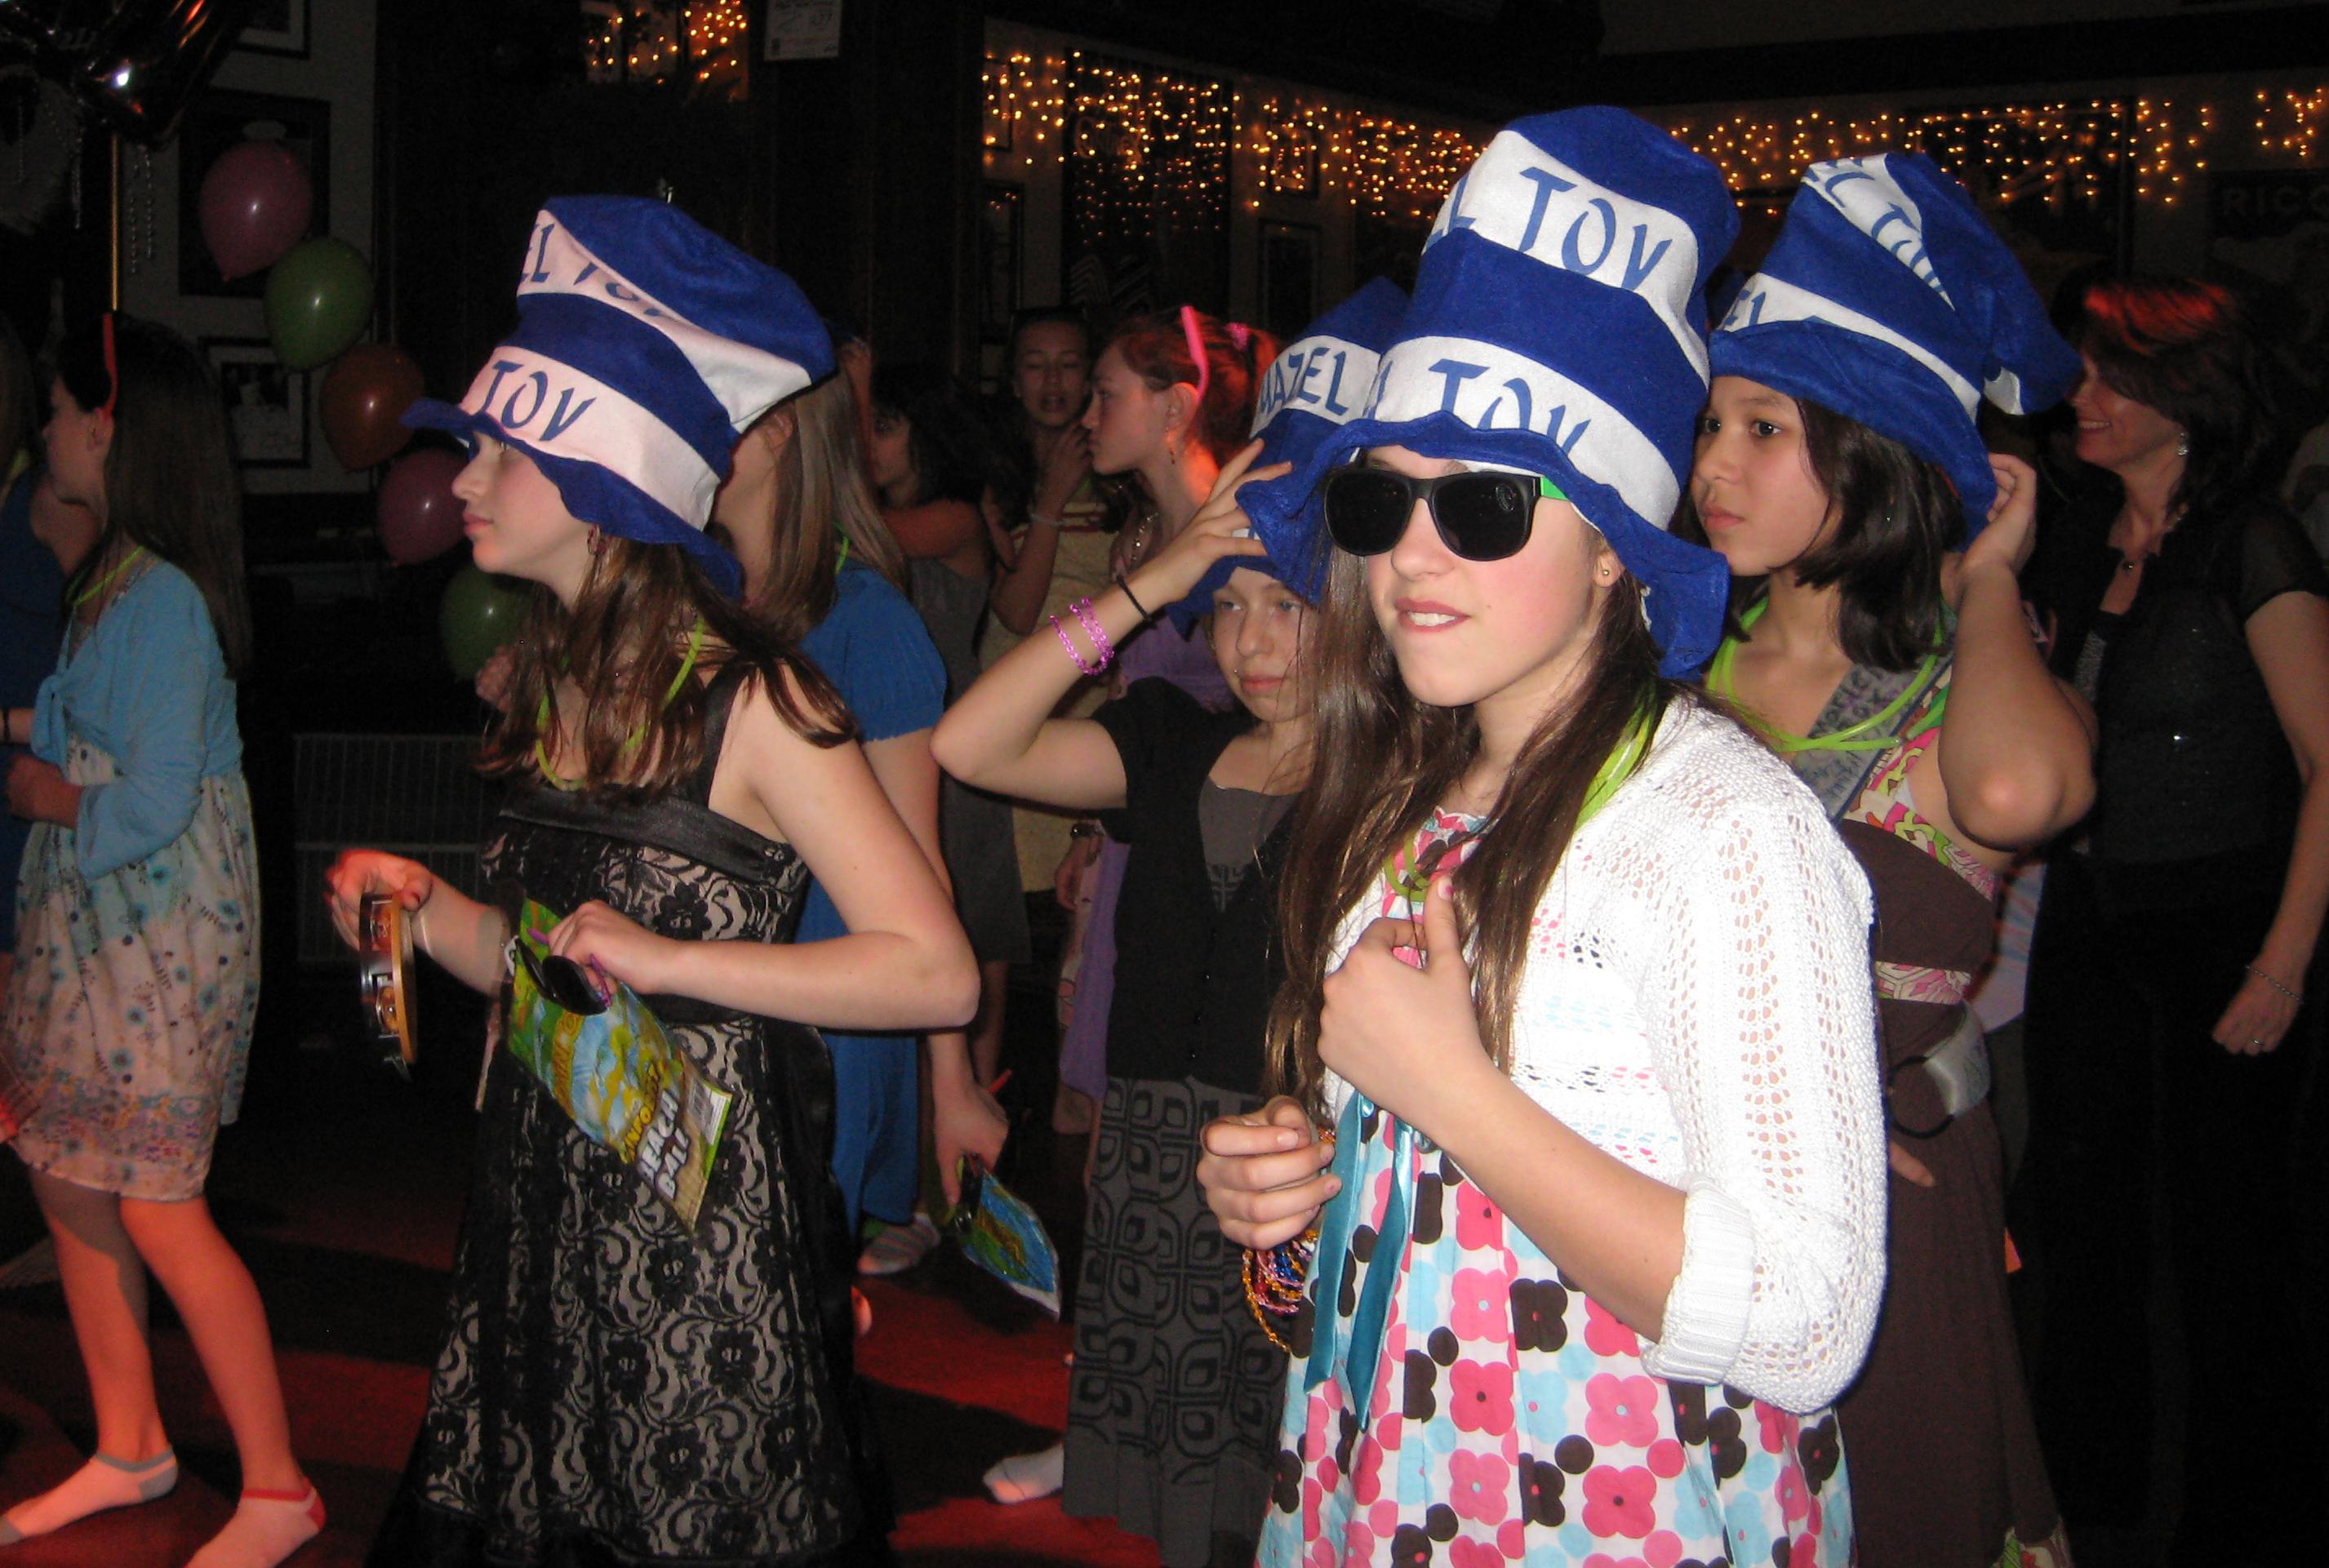 rockin_the_mazel_tov_hats